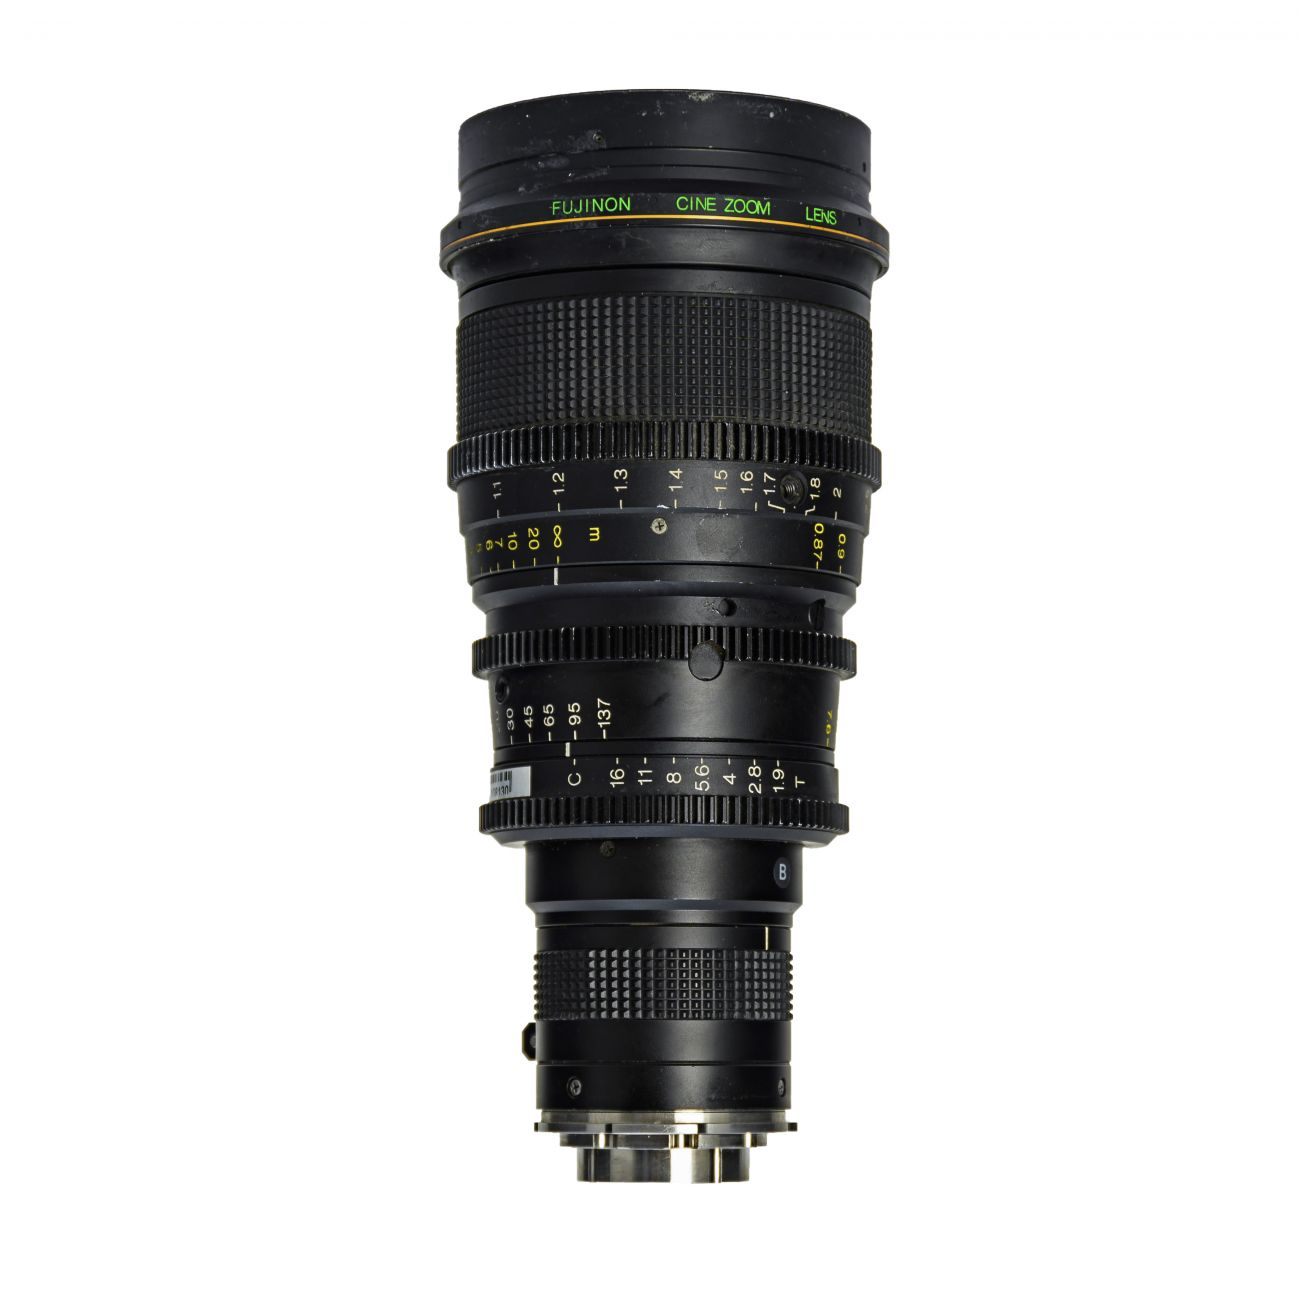 7.6-137mm T1.9 Fujinon Cine Zoom Lens HAc18x7,6-M